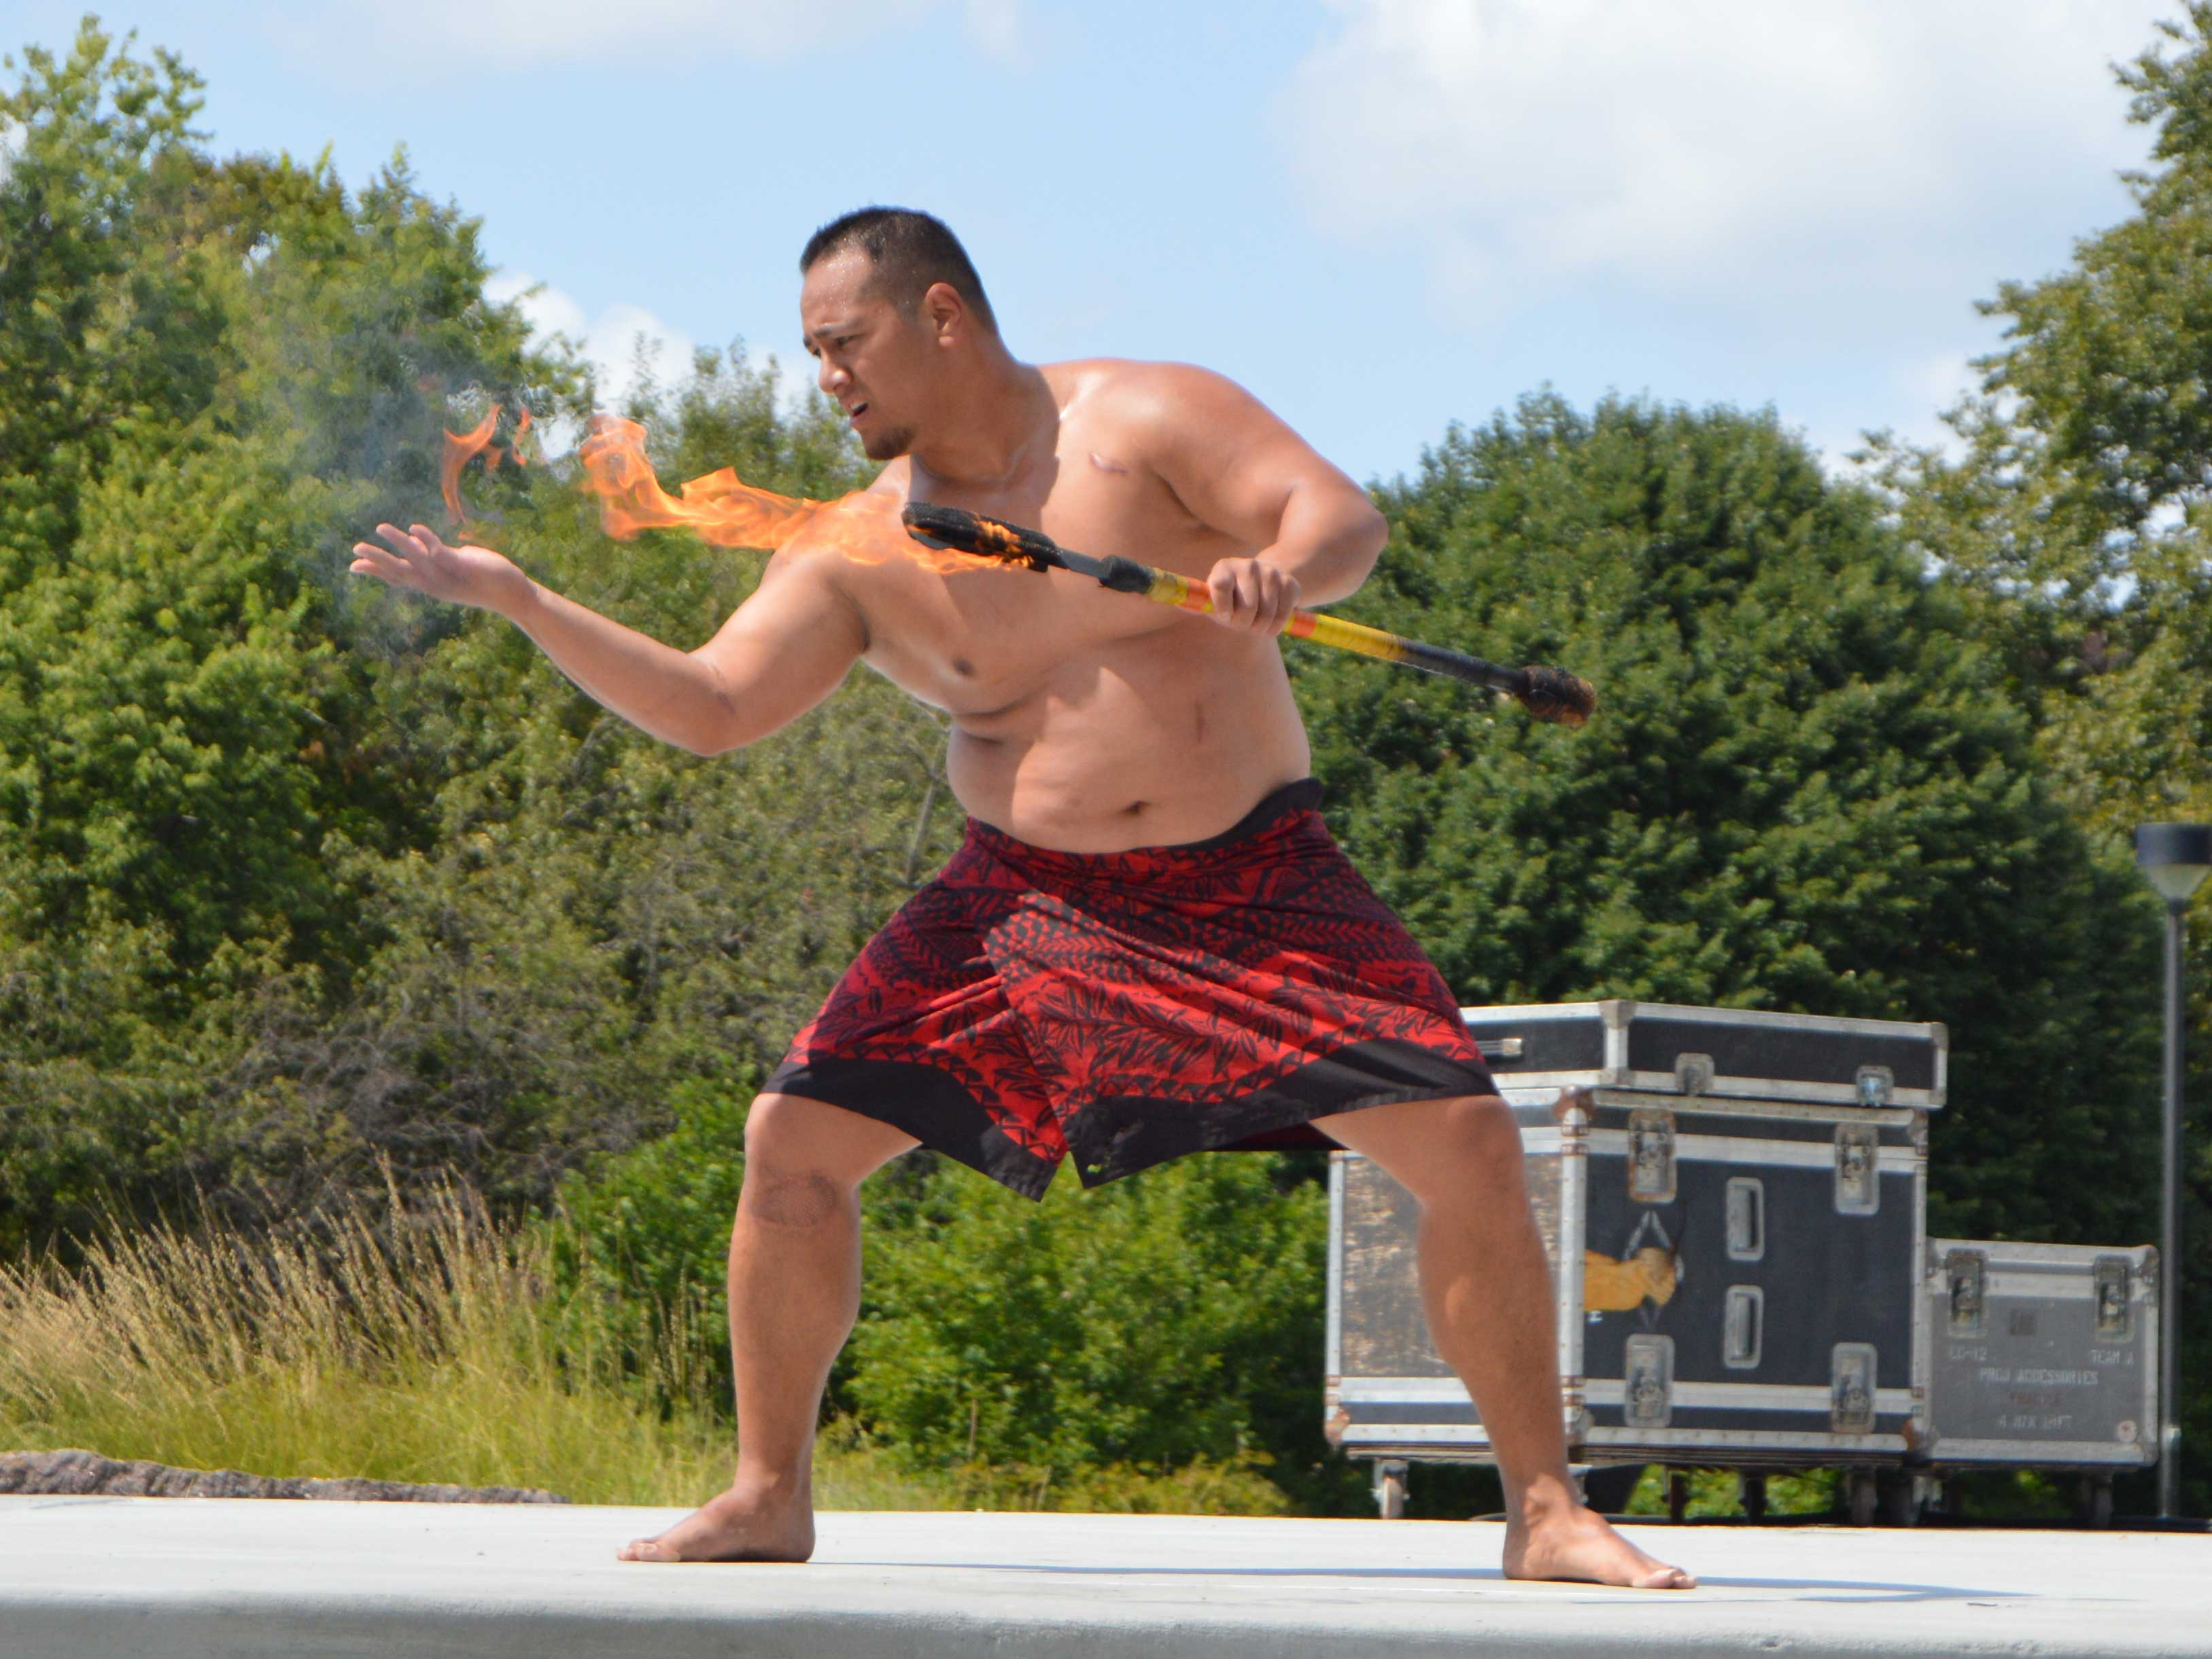 Polynesian torch dancer at University of Nebraska-Lincoln OASIS Kickoff event on Aug. 27, 2017.